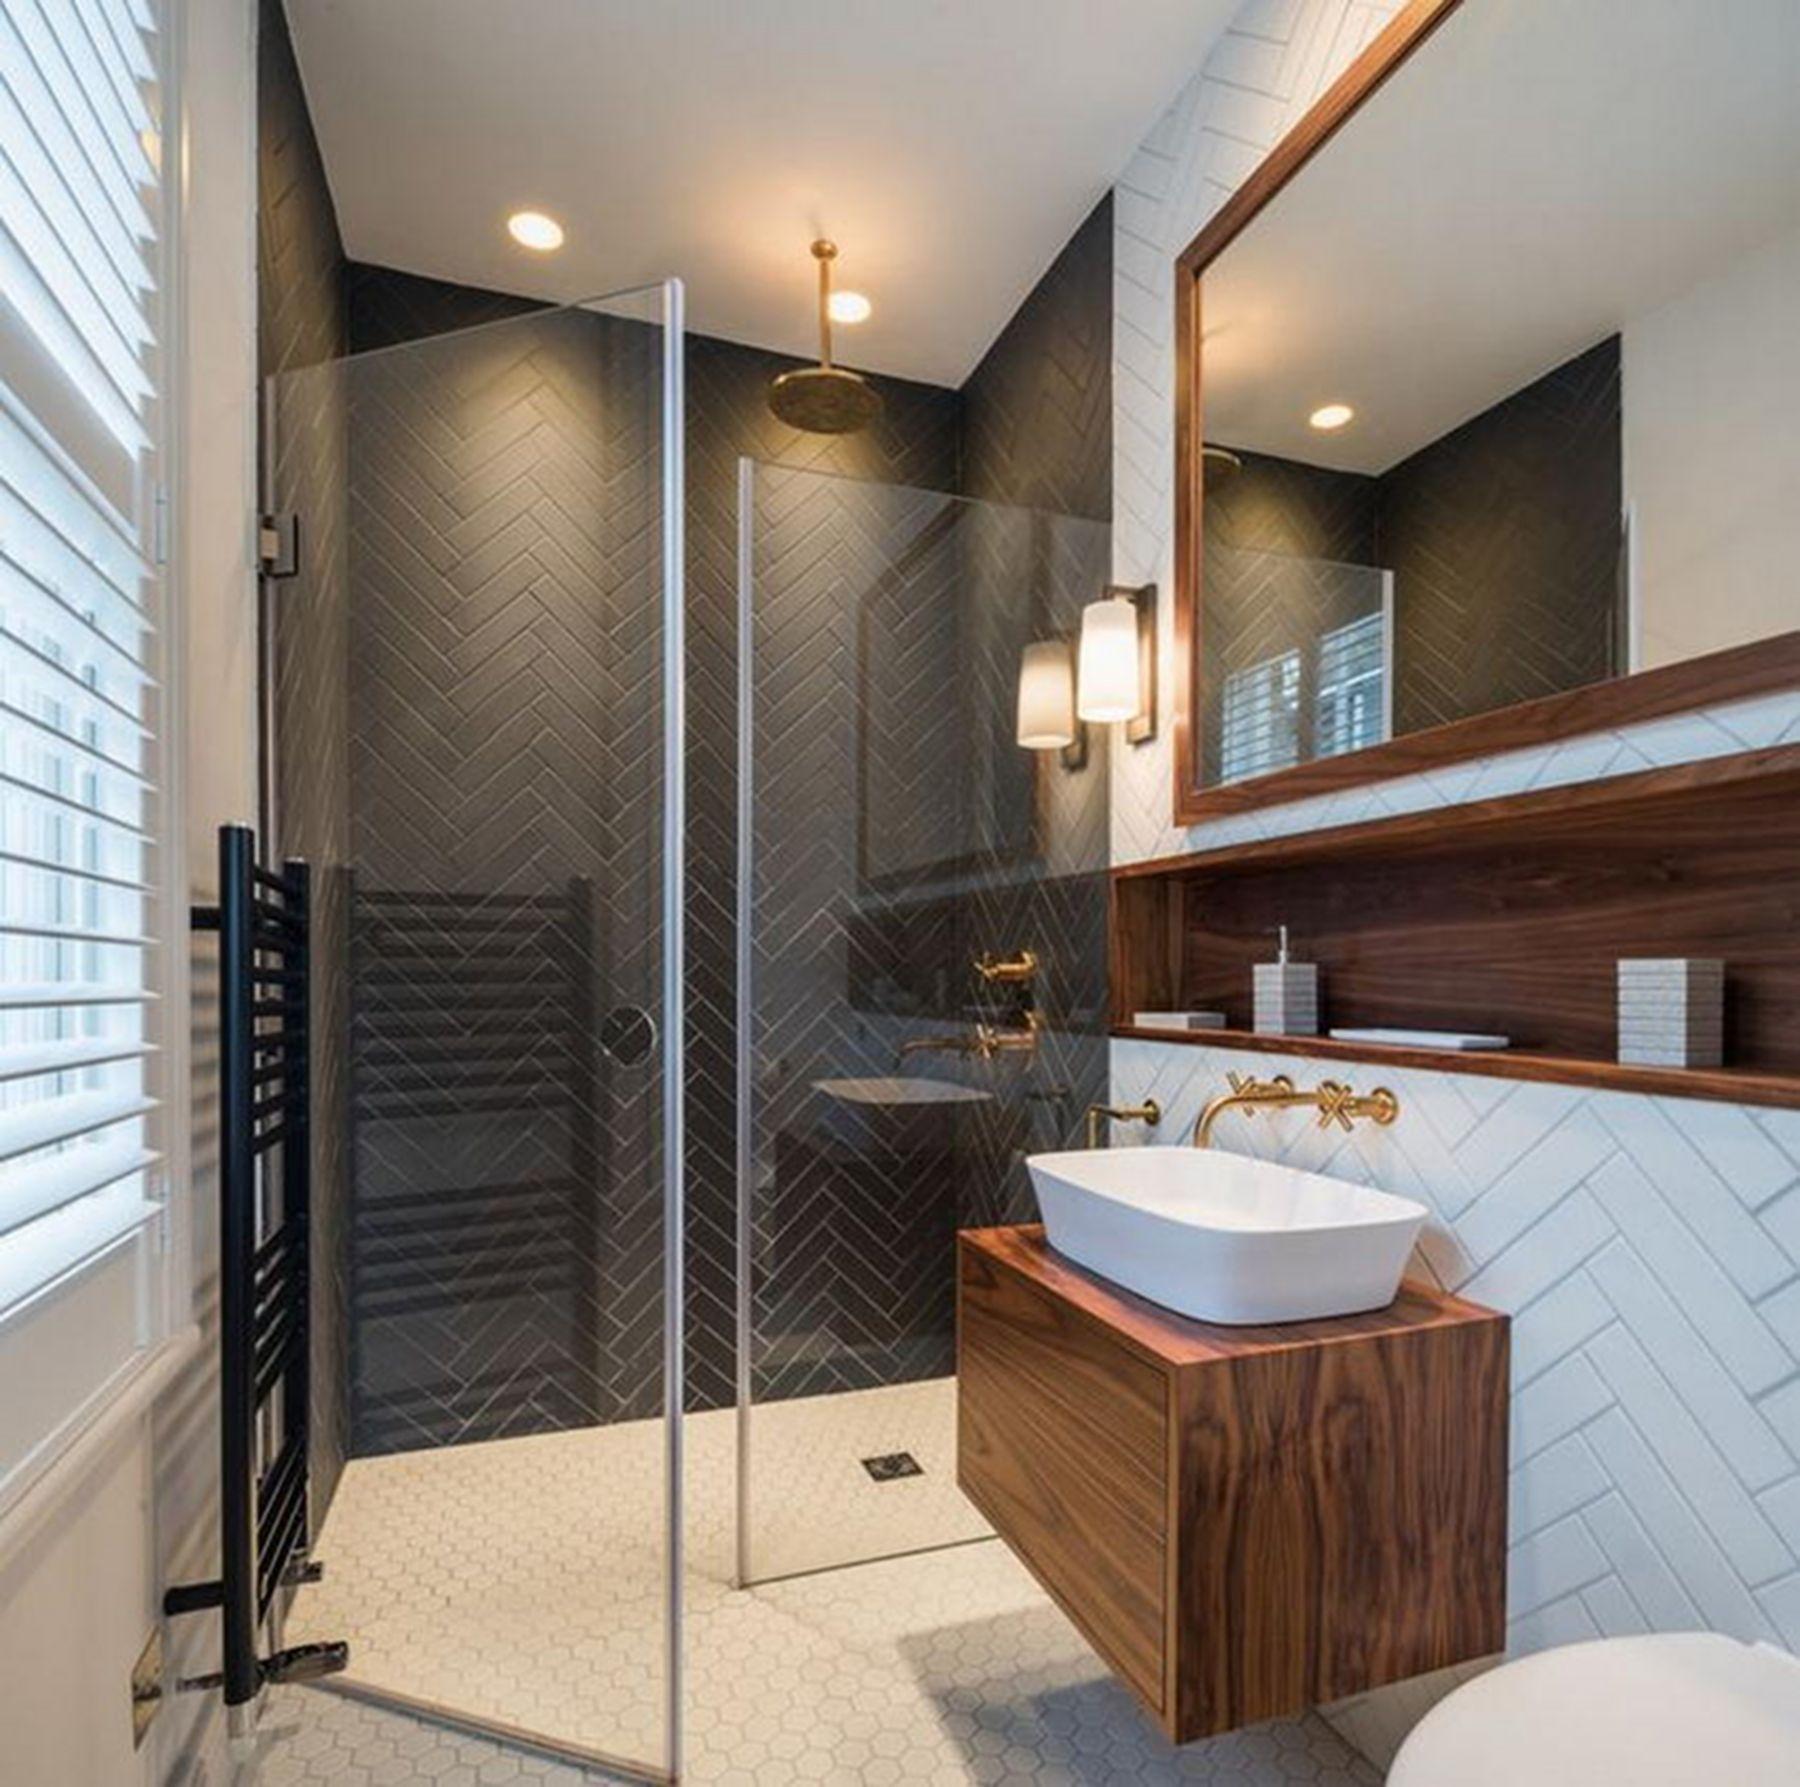 15 stunning small bathroom design idea for the limitations on stunning small bathroom design ideas id=31408